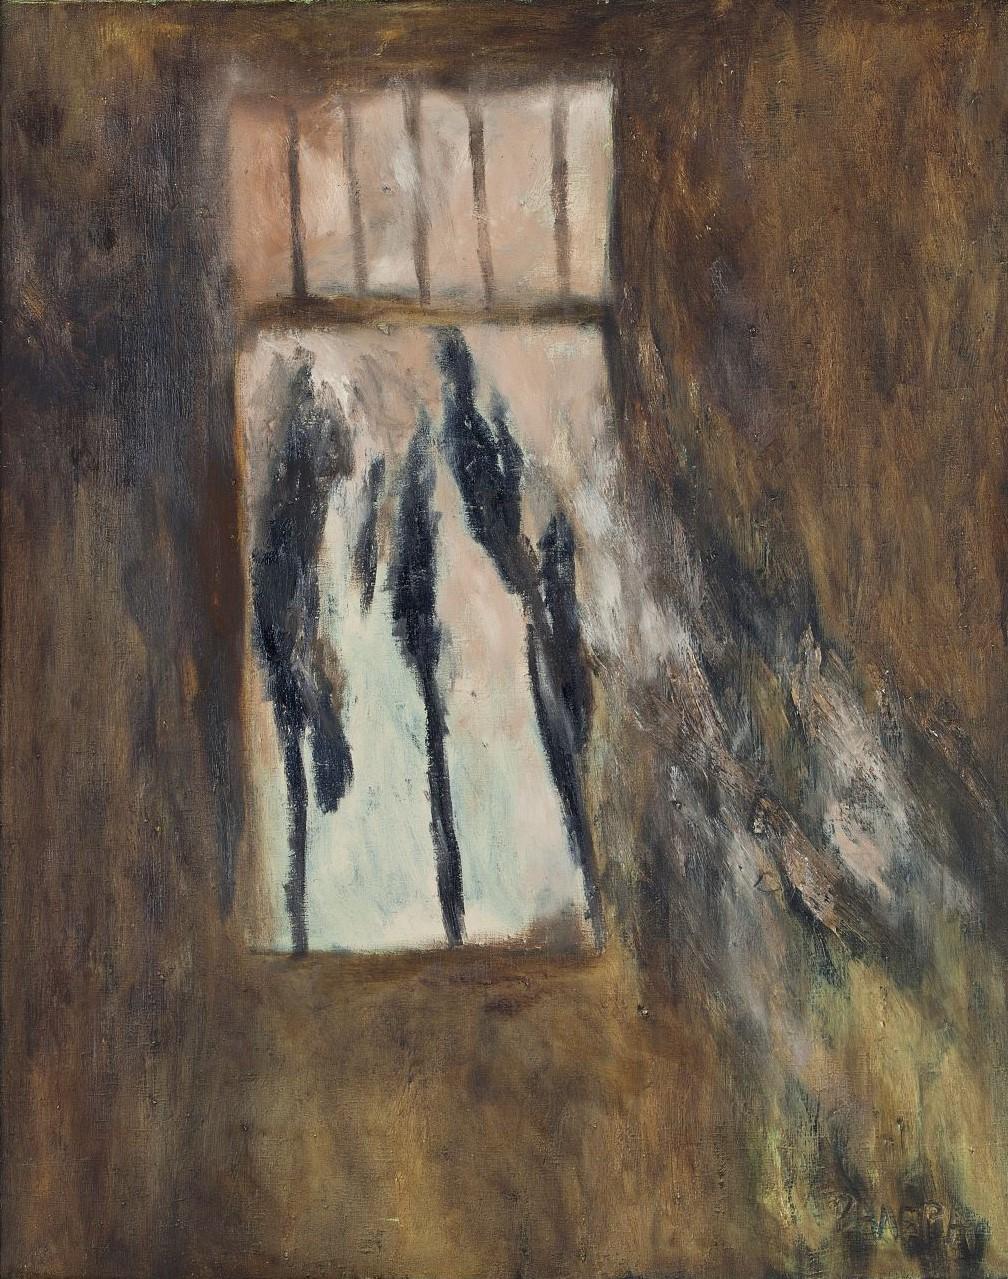 Valery Pesin, Rembrandt | 1993